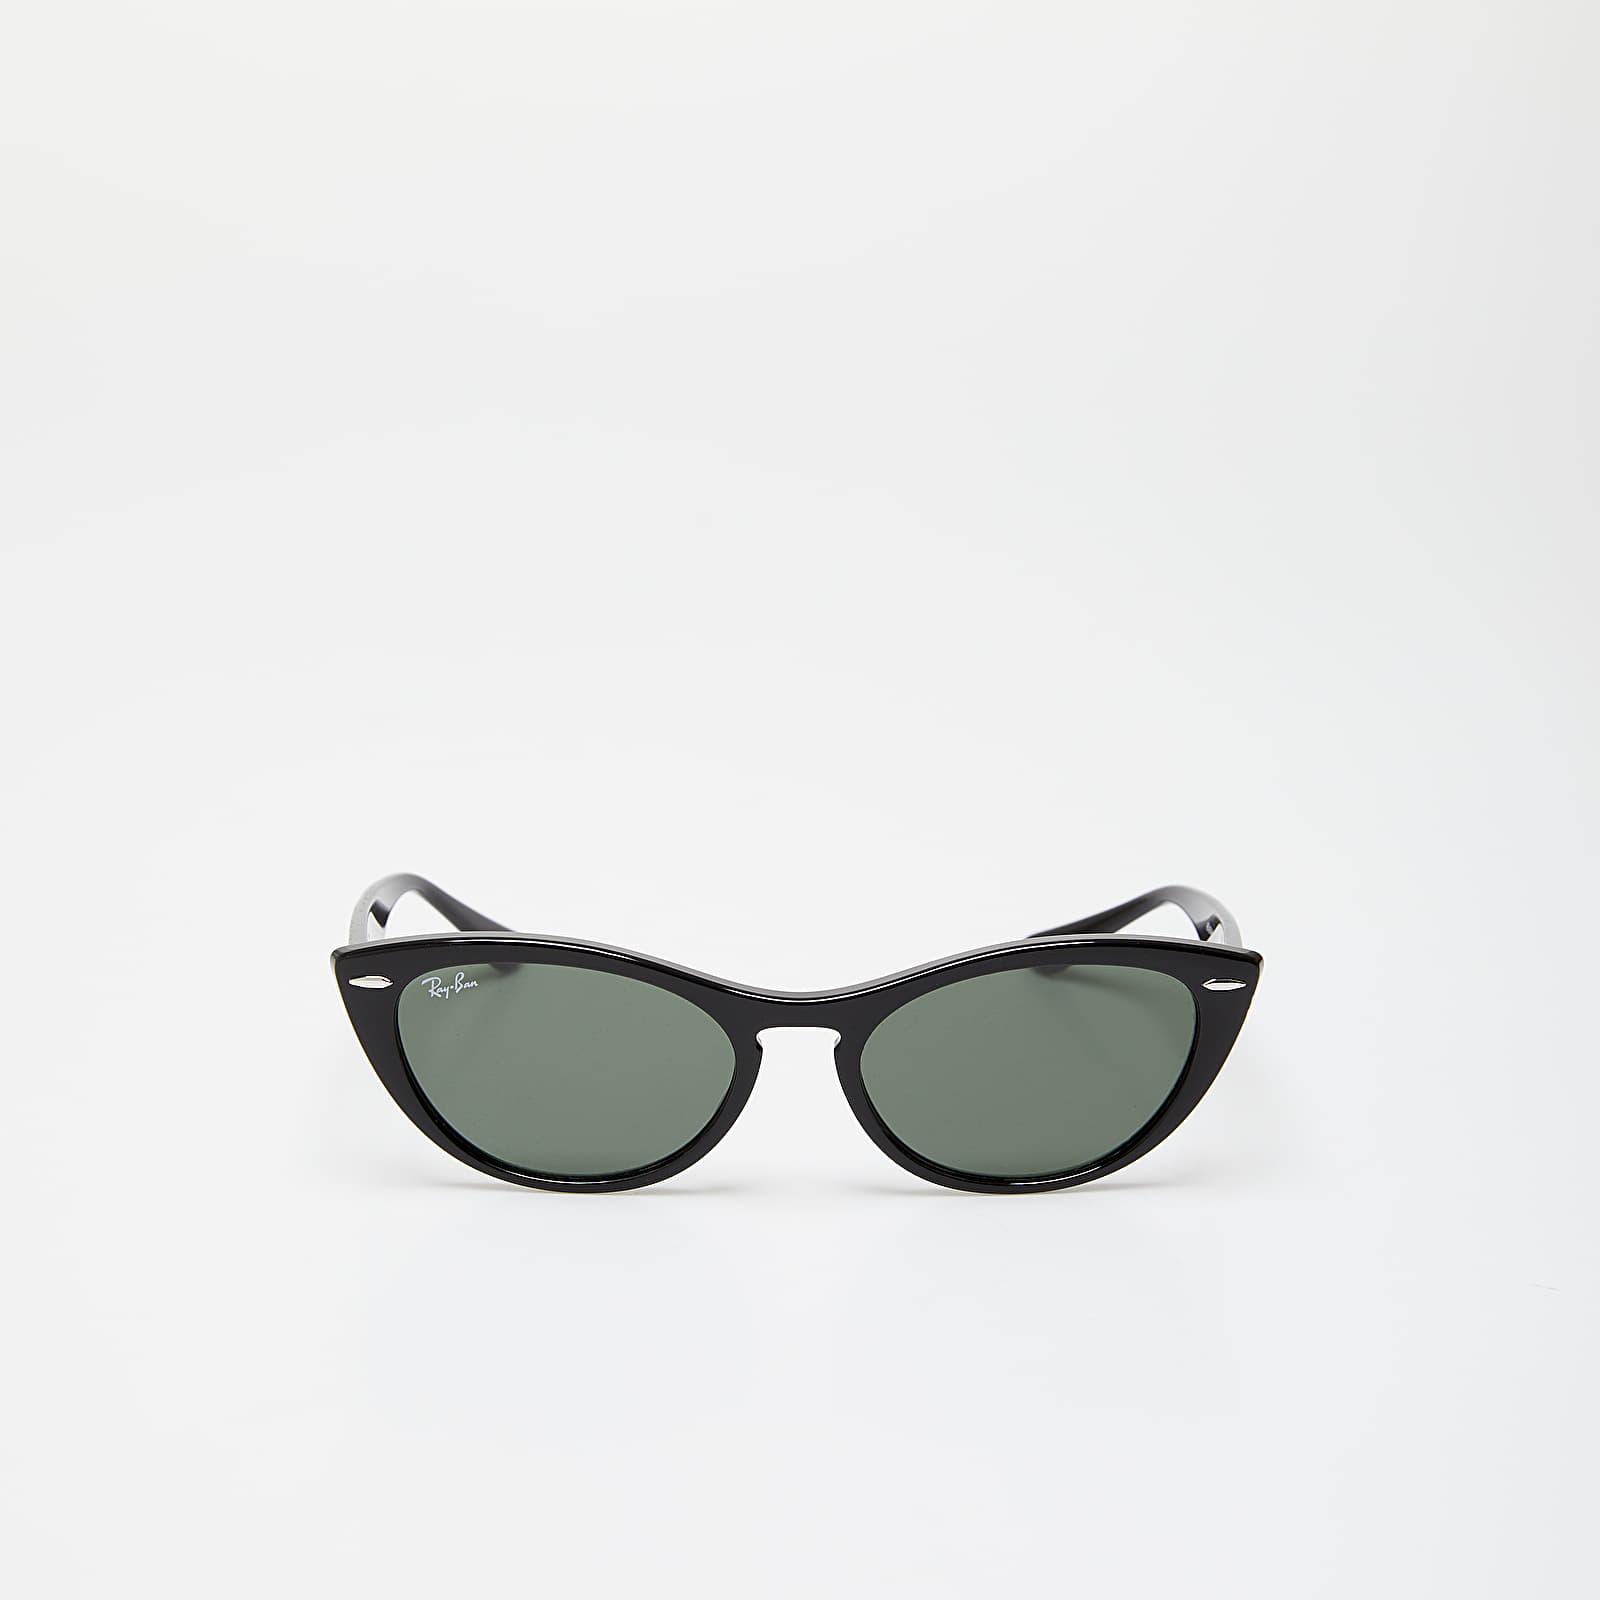 Ray Ban Nina Sunglasses